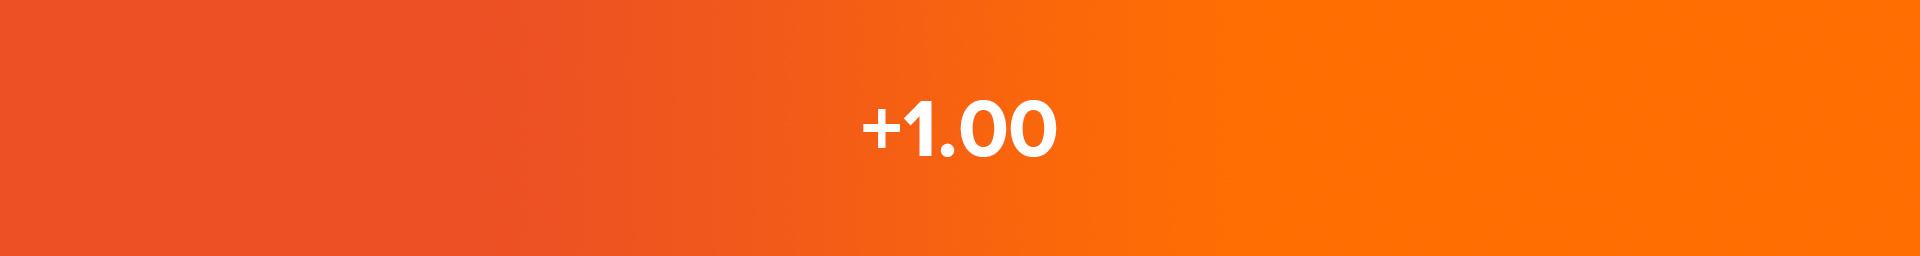 +1.00